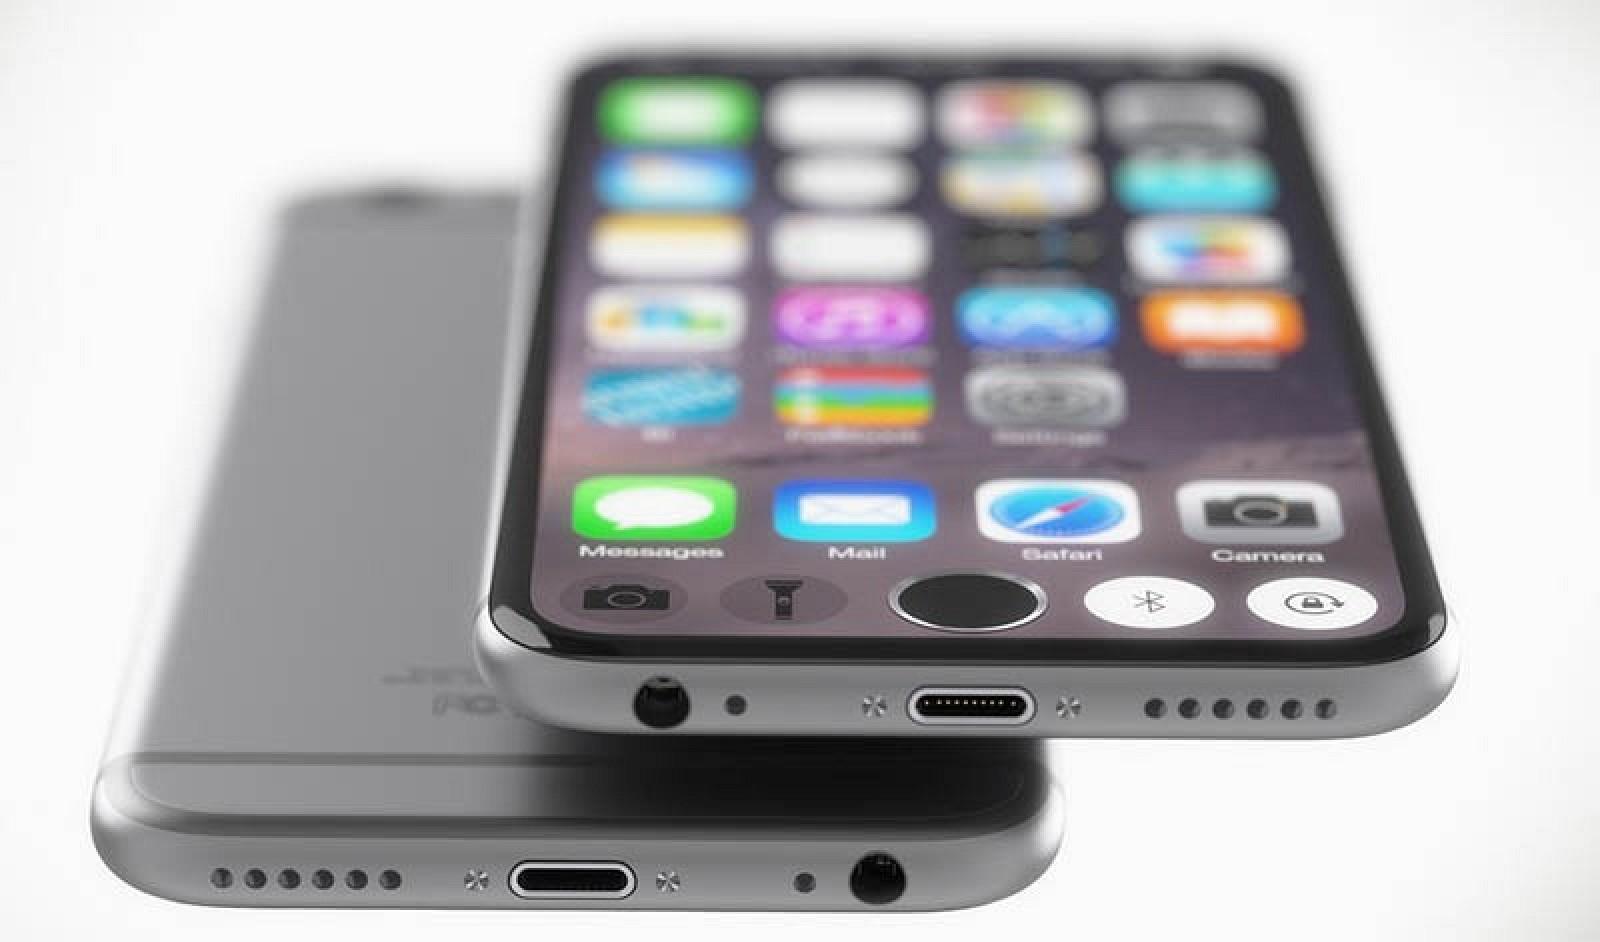 Iphone 7 waterproof rumors persist amid claims of hidden antenna iphone 7 waterproof rumors persist amid claims of hidden antenna bands mac rumors baditri Choice Image